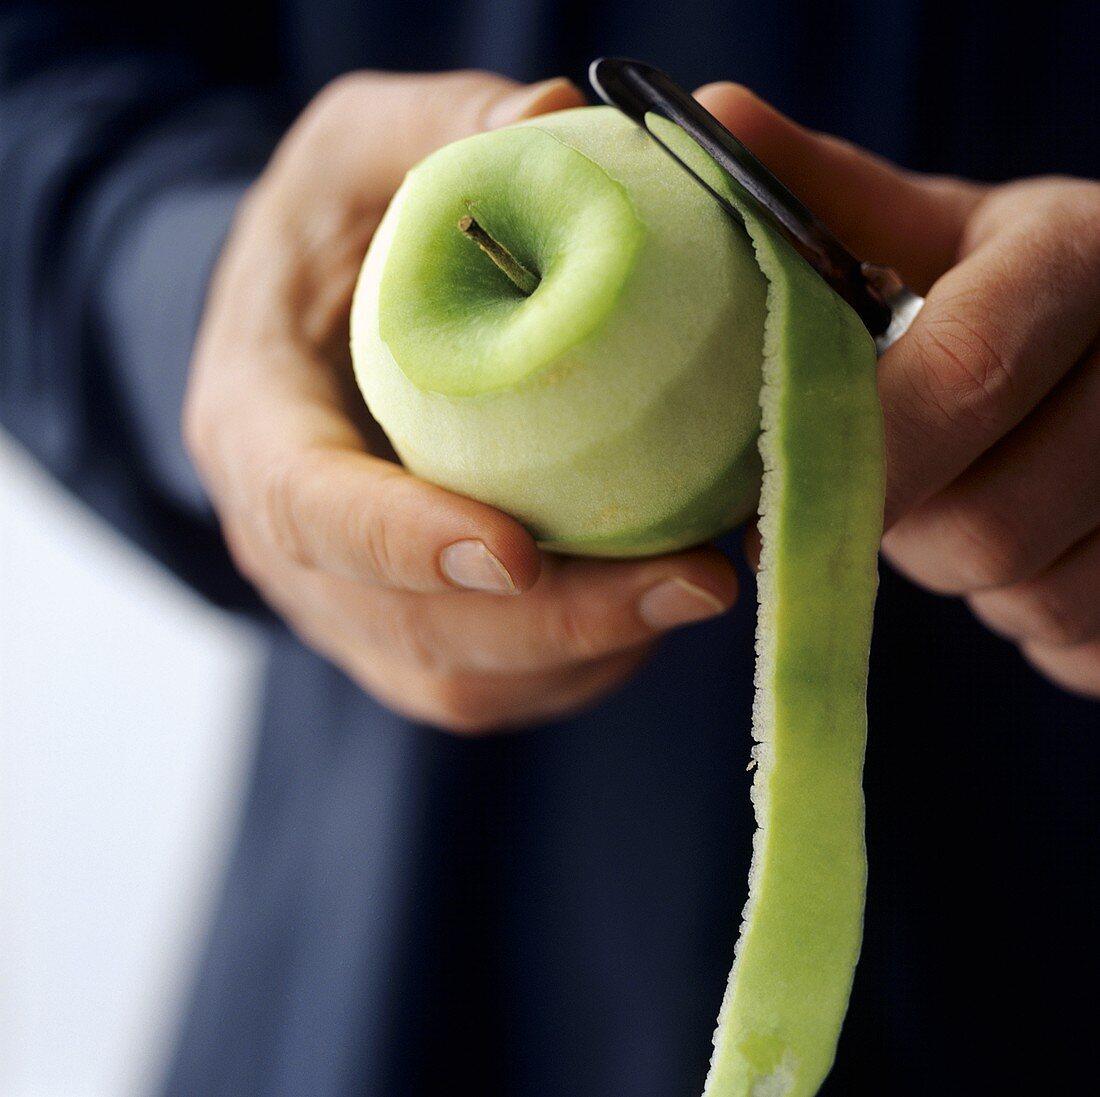 Peeling a Granny Smith apple